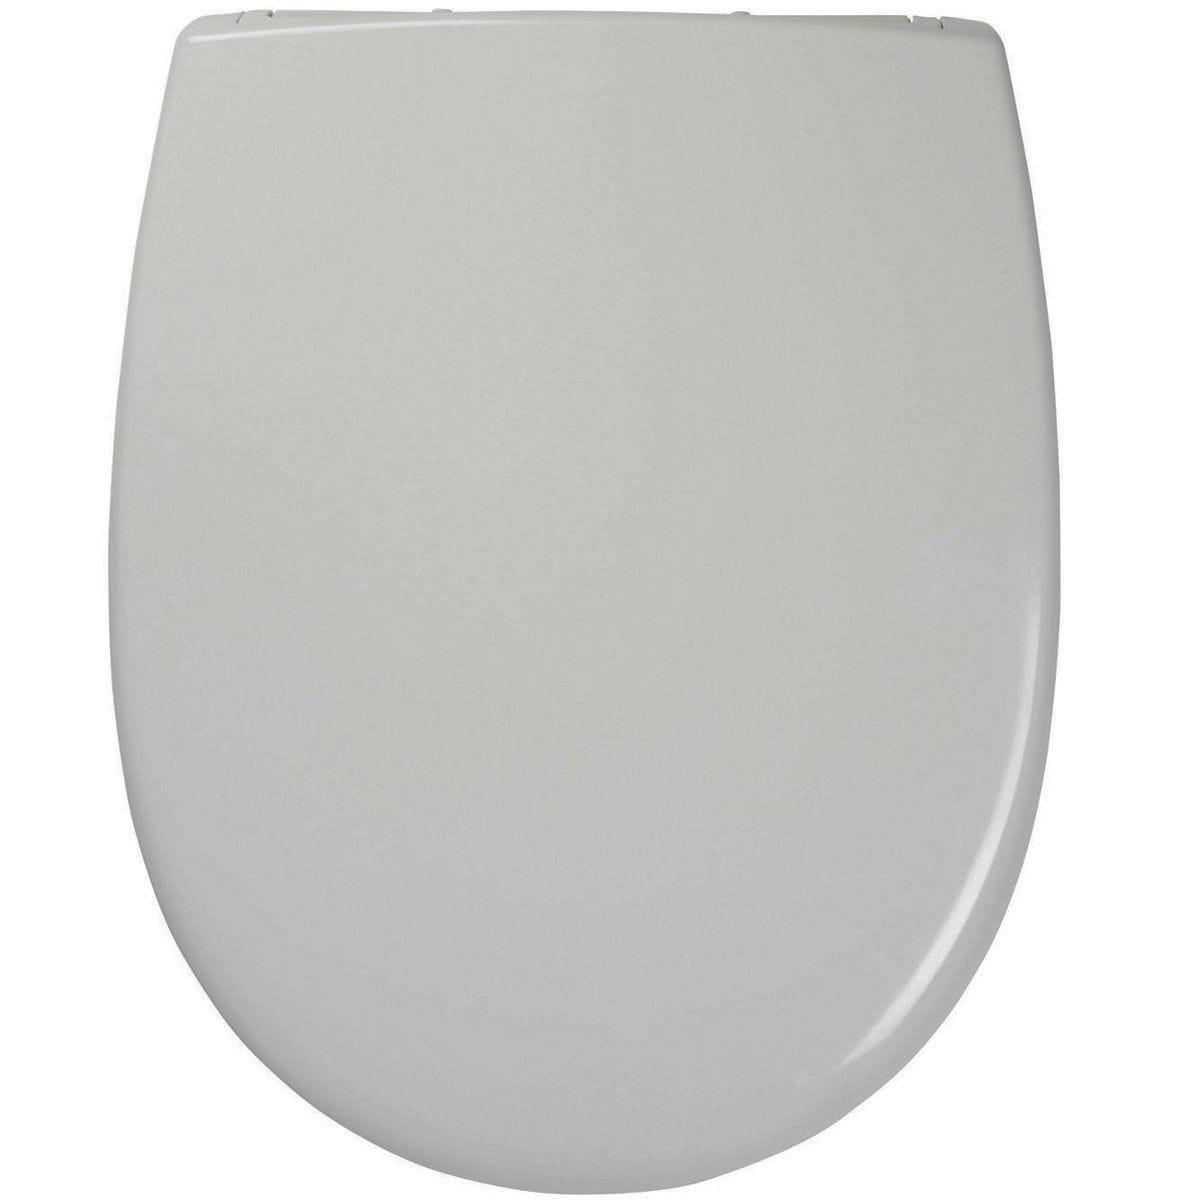 Bemis Thermoplastic Push Button Top Fix Slow Close Toilet Seat